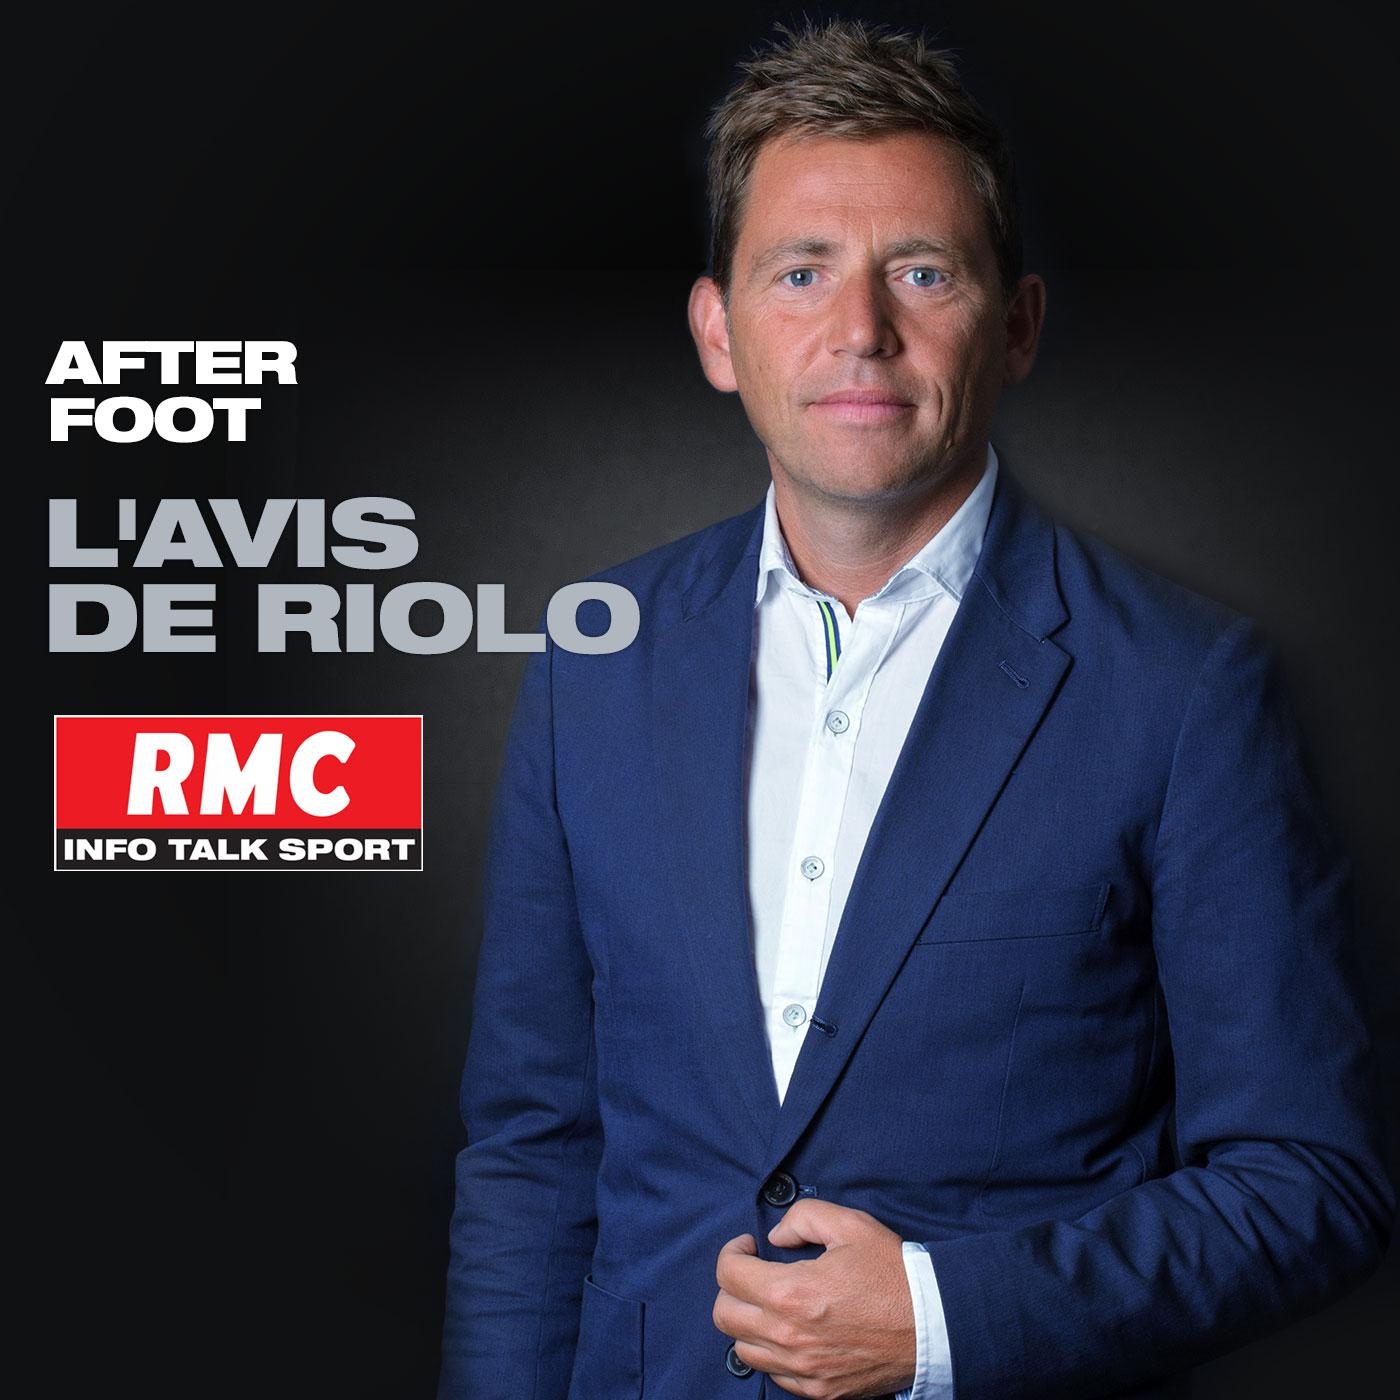 L Avis De Riolo Podcast Rmc Listen Notes